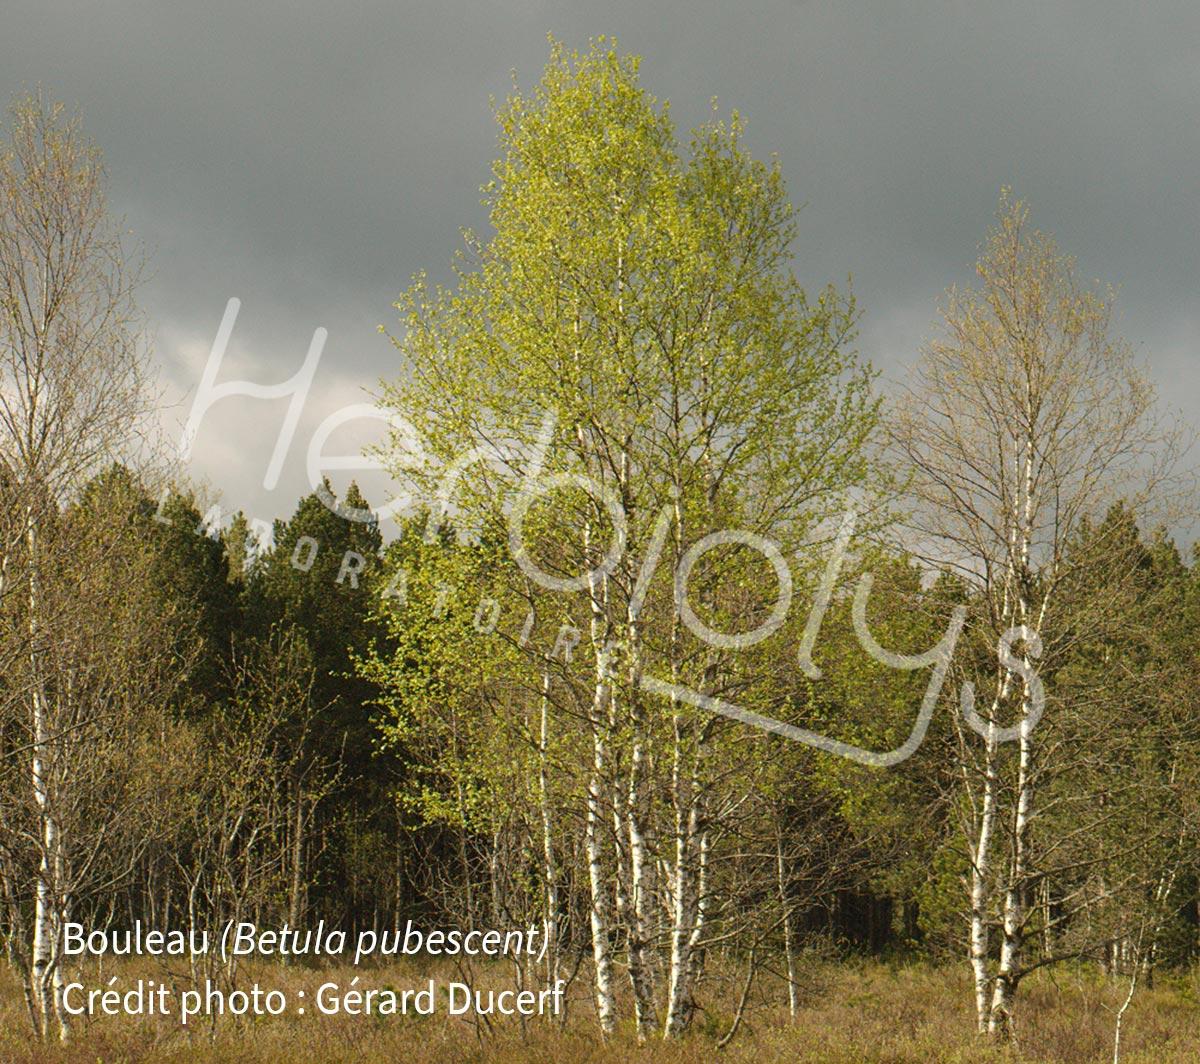 Herbiolys-bouleau-betula-pubescent